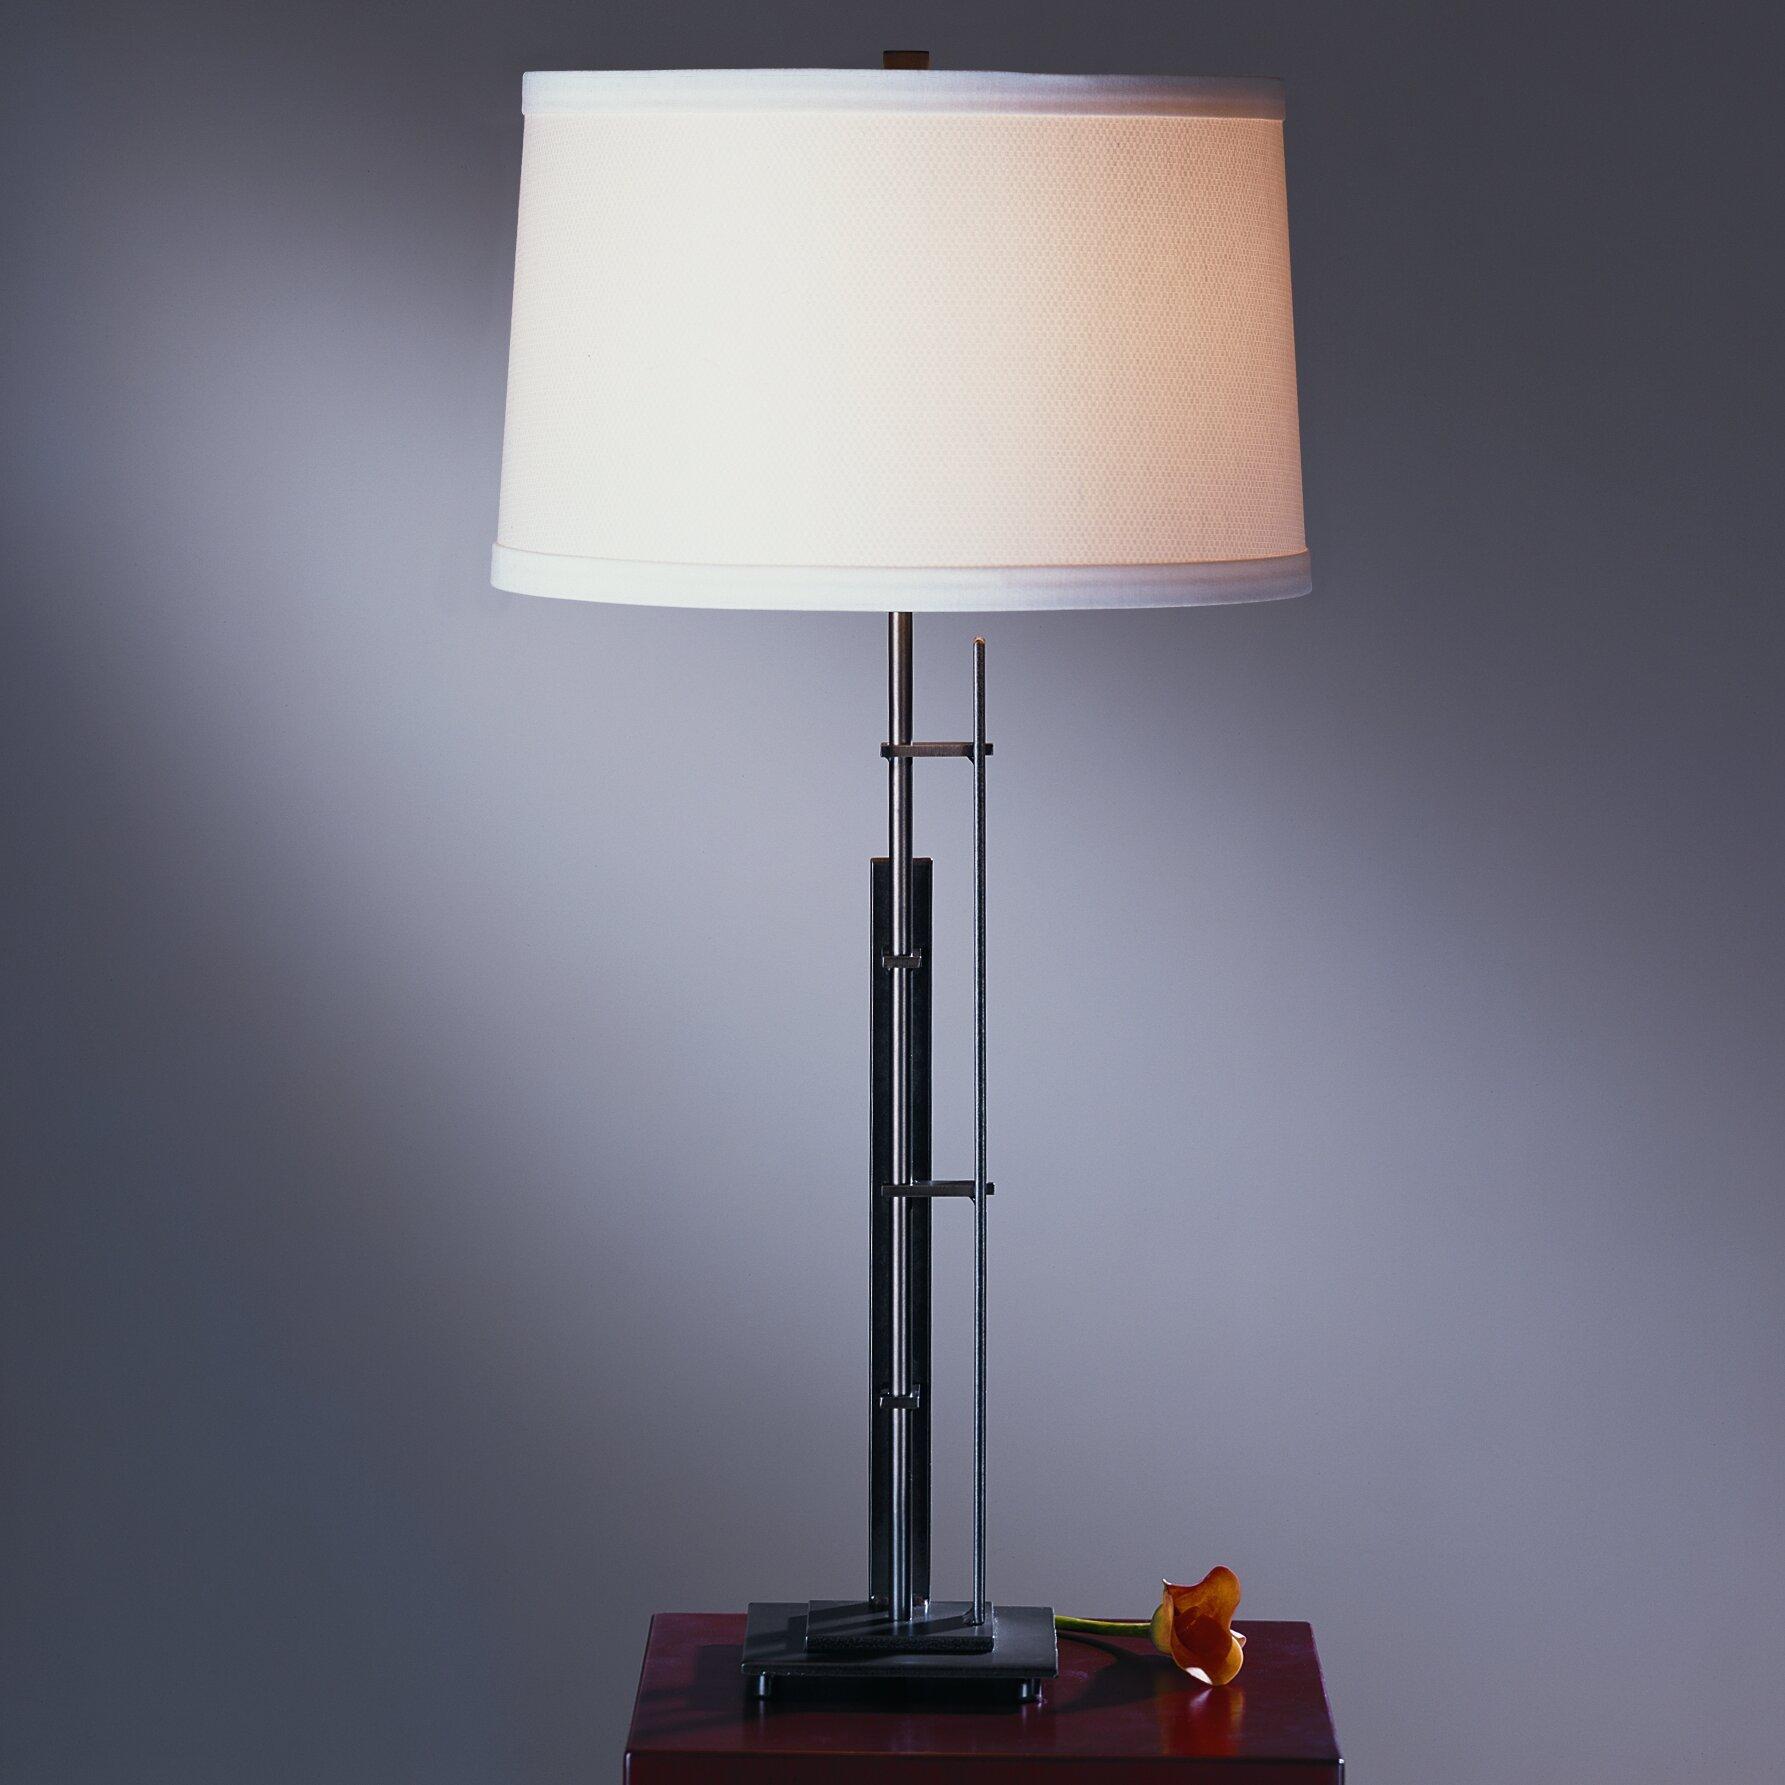 Hubbardton forge metra 26 9 table lamp wayfair